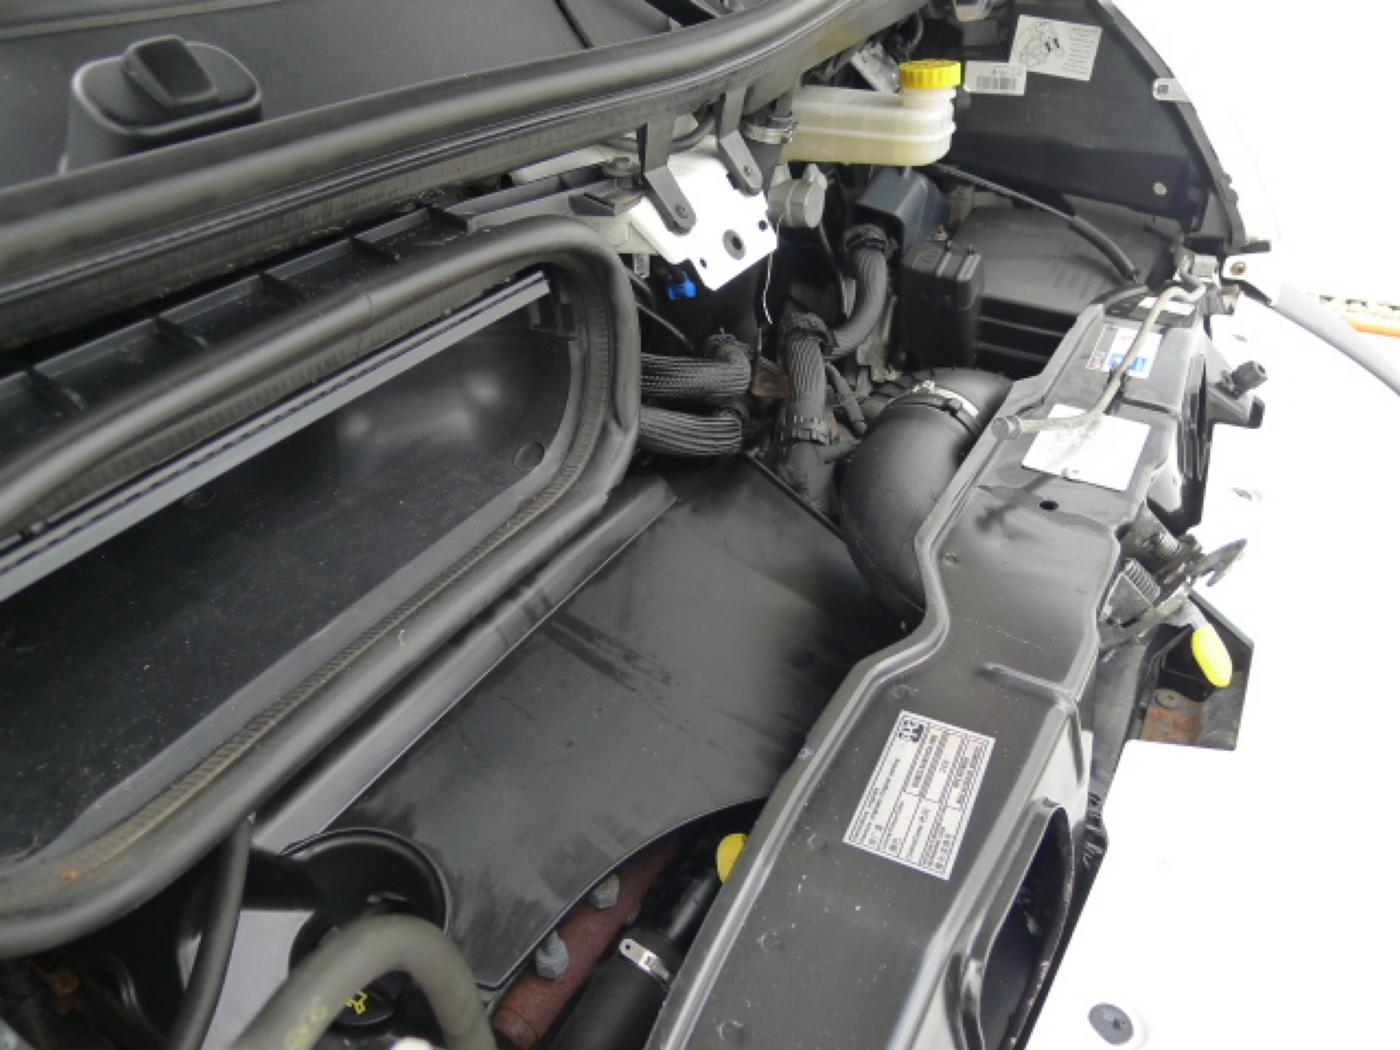 Peugeot Boxer 2.2 HDI L1H1 Klima Akce!!! Novinka - 19